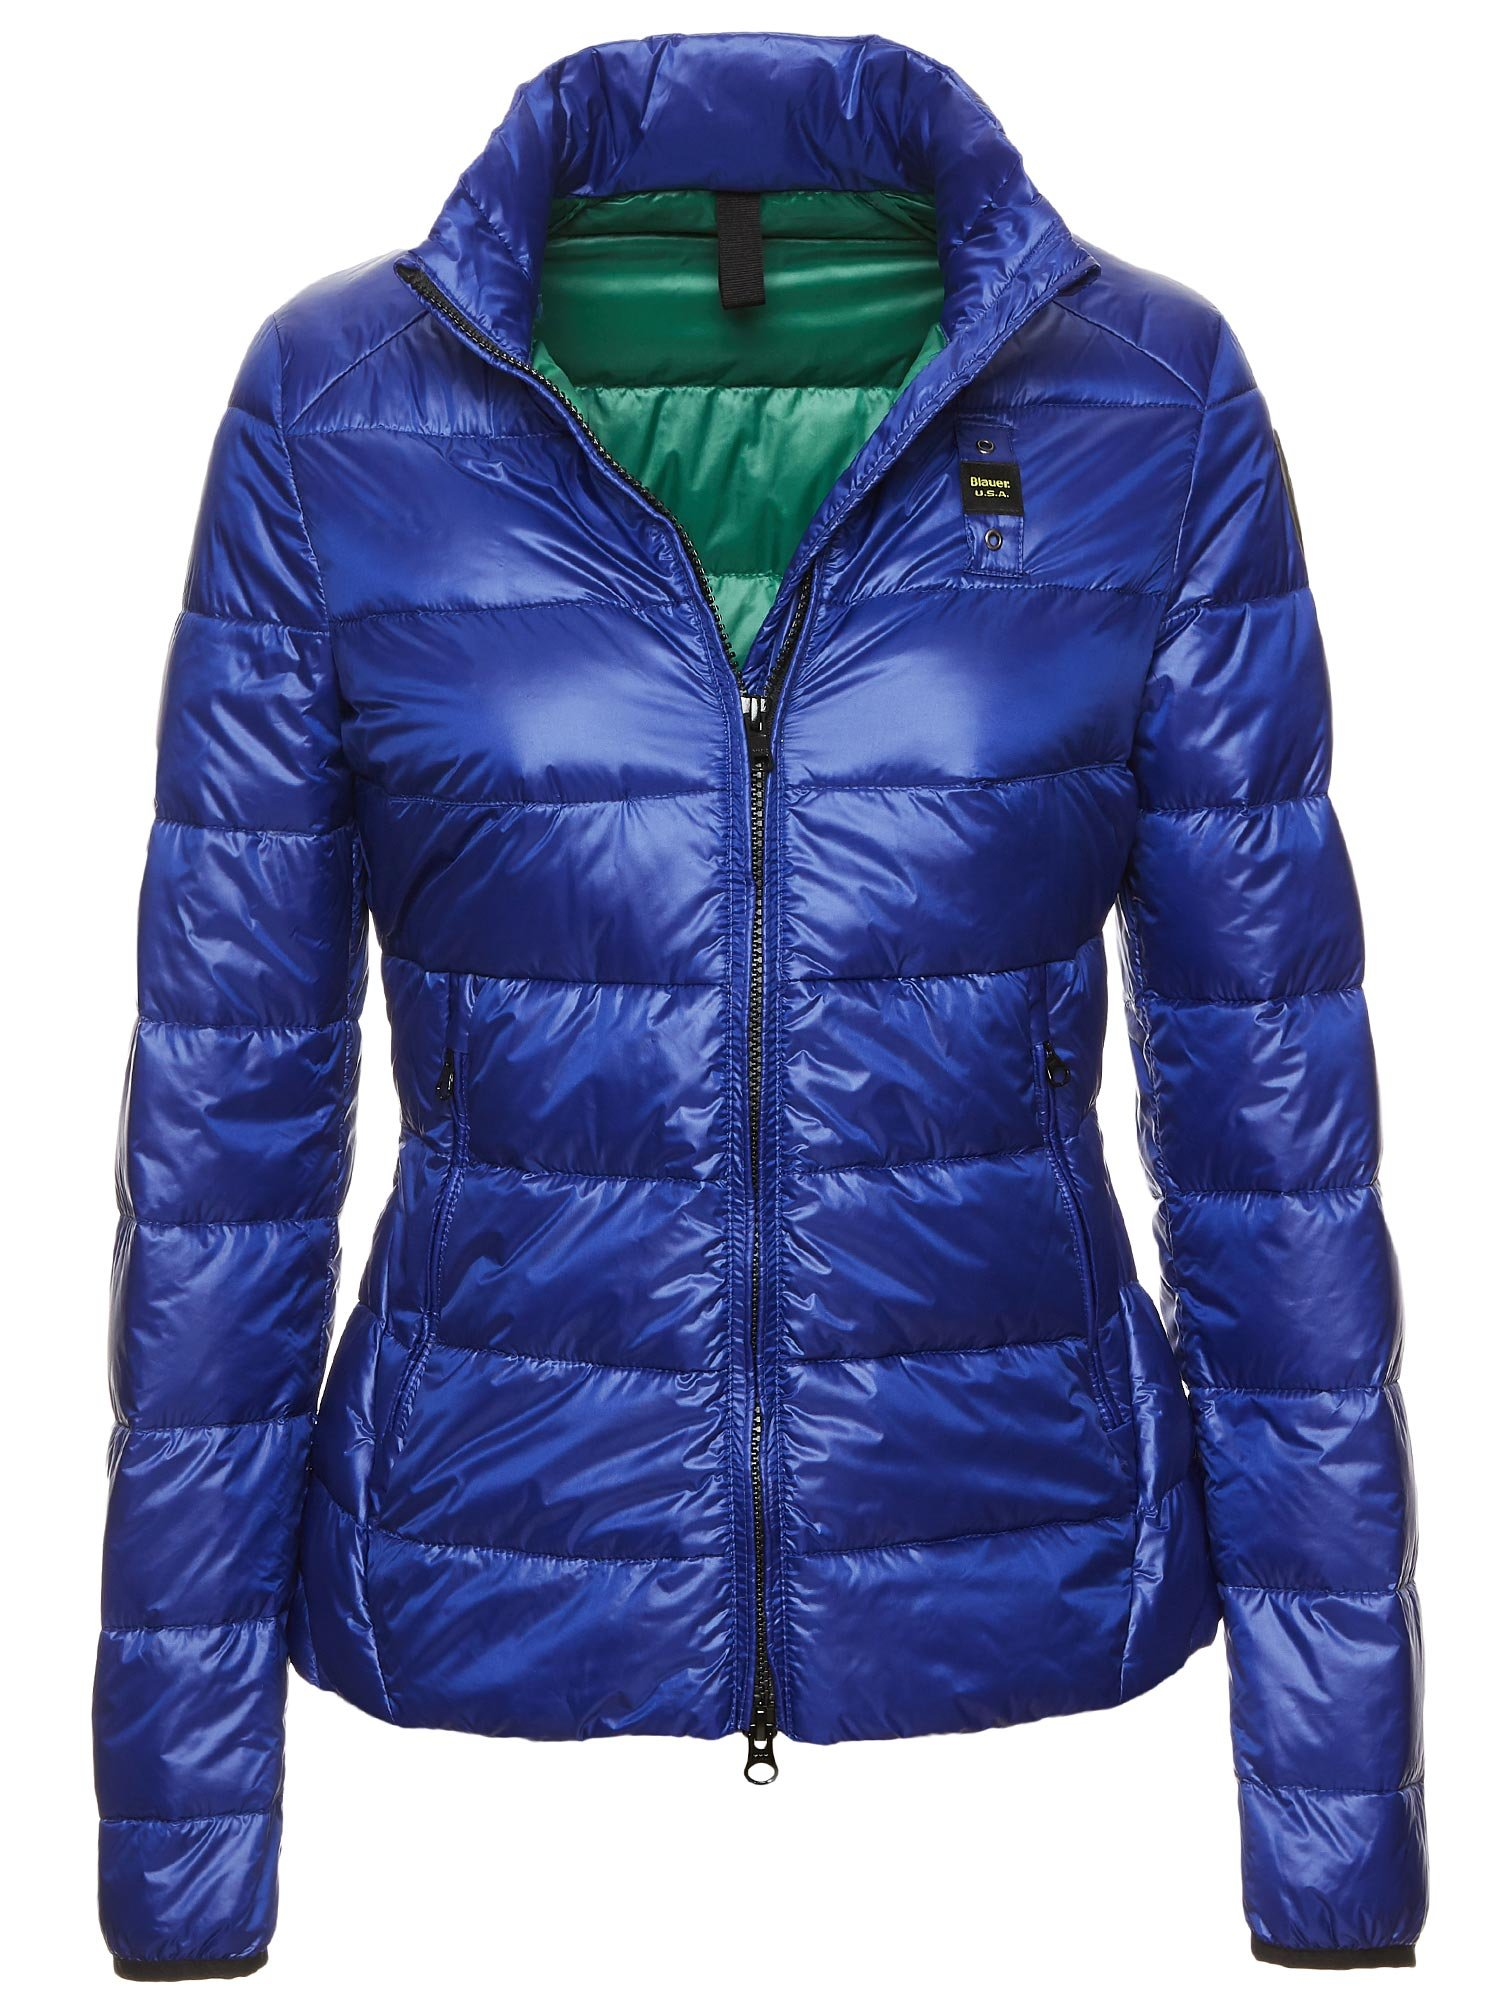 MILA DOWN JACKET 100 GRAMS - Blu Limoges ins Green - Blauer